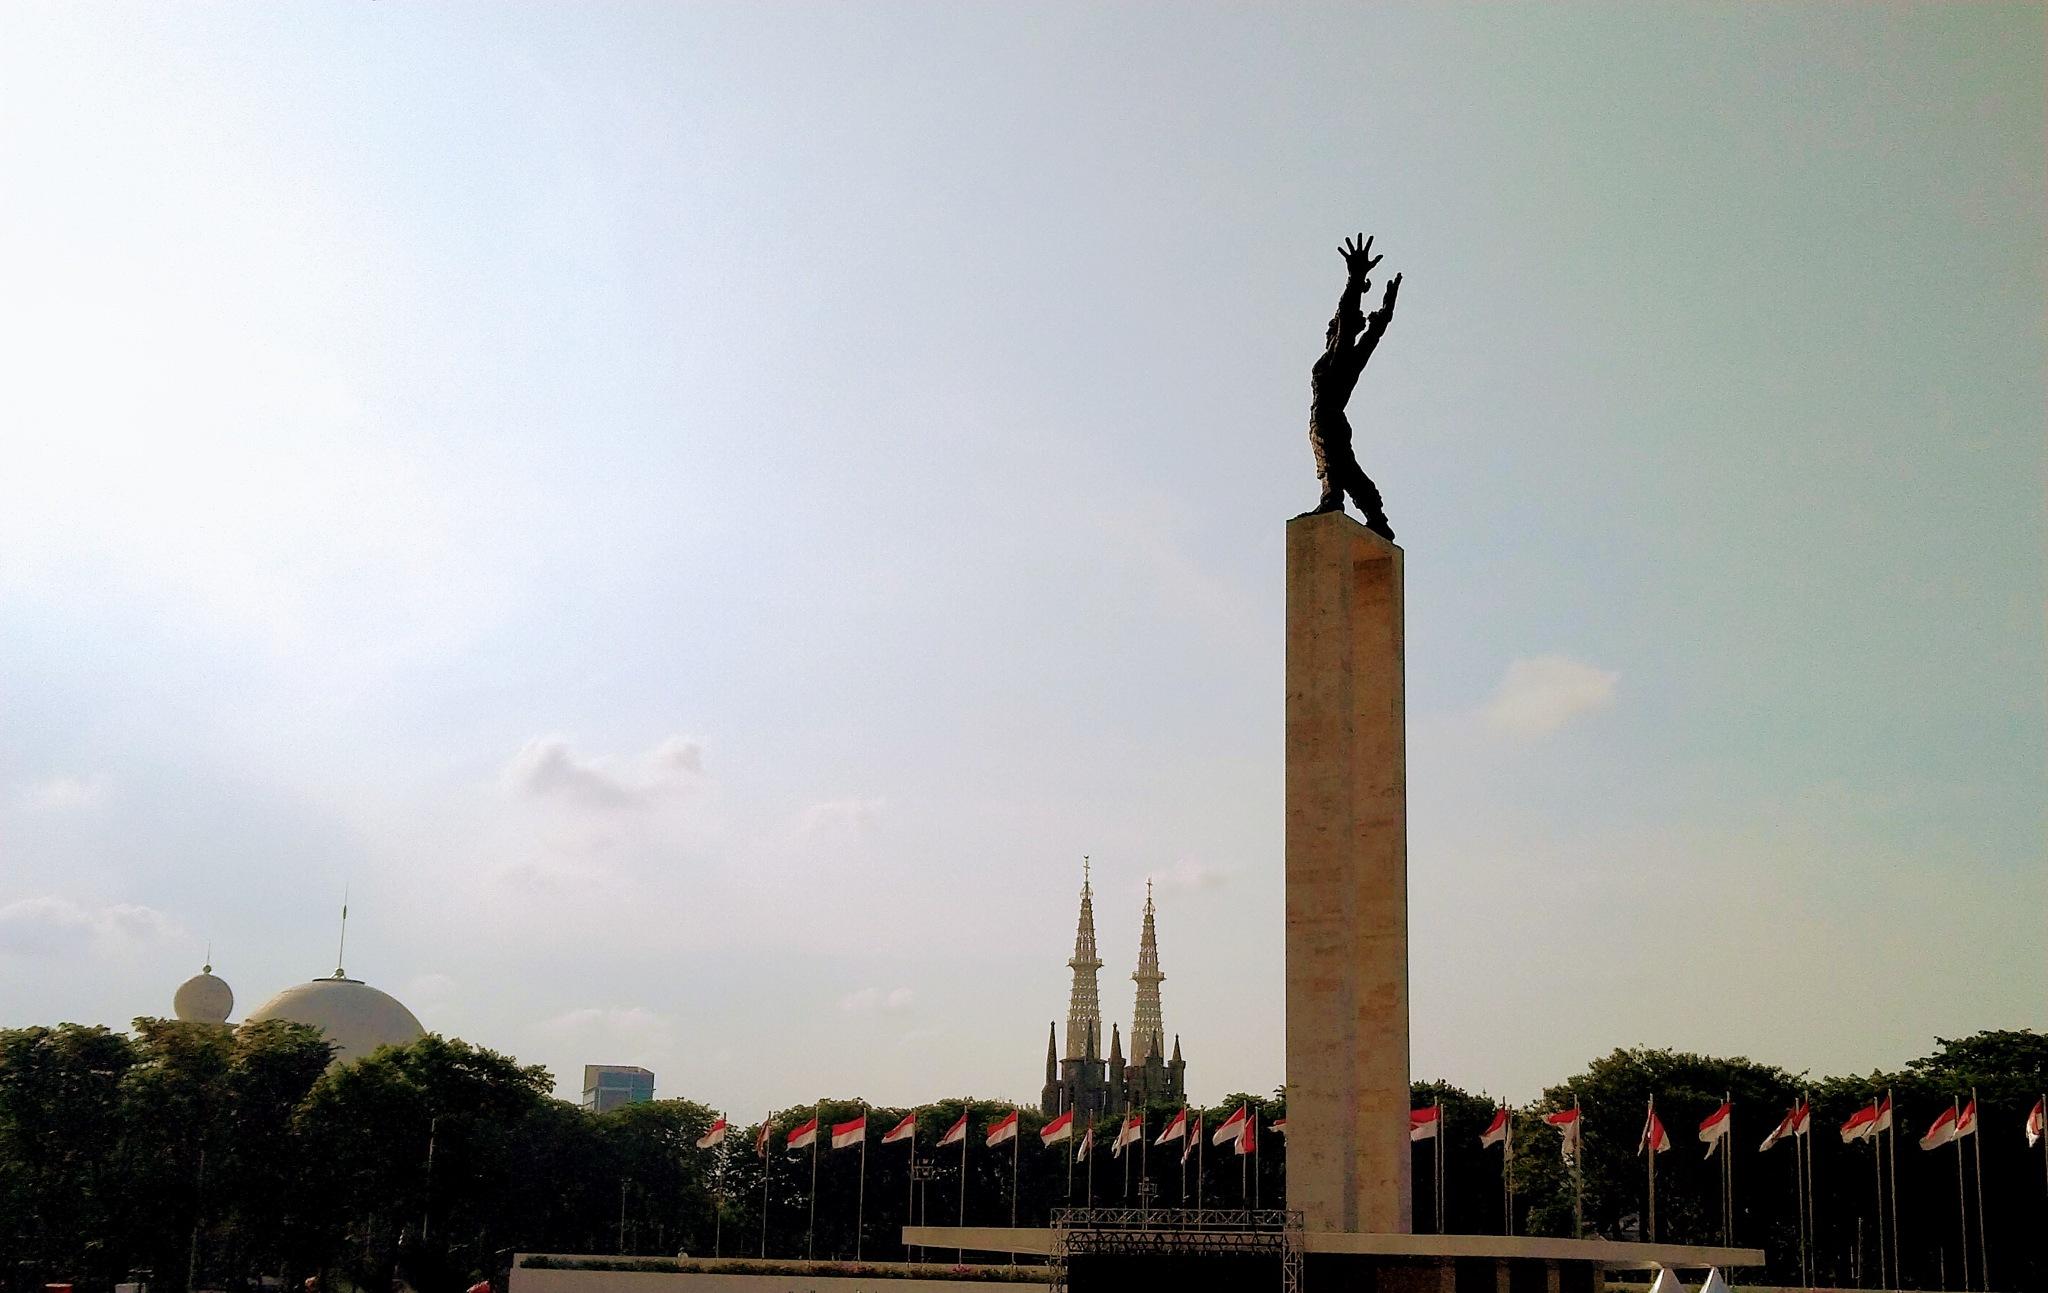 The Monument Of Irian Jaya Barat Freedom  by Jc_Aldi